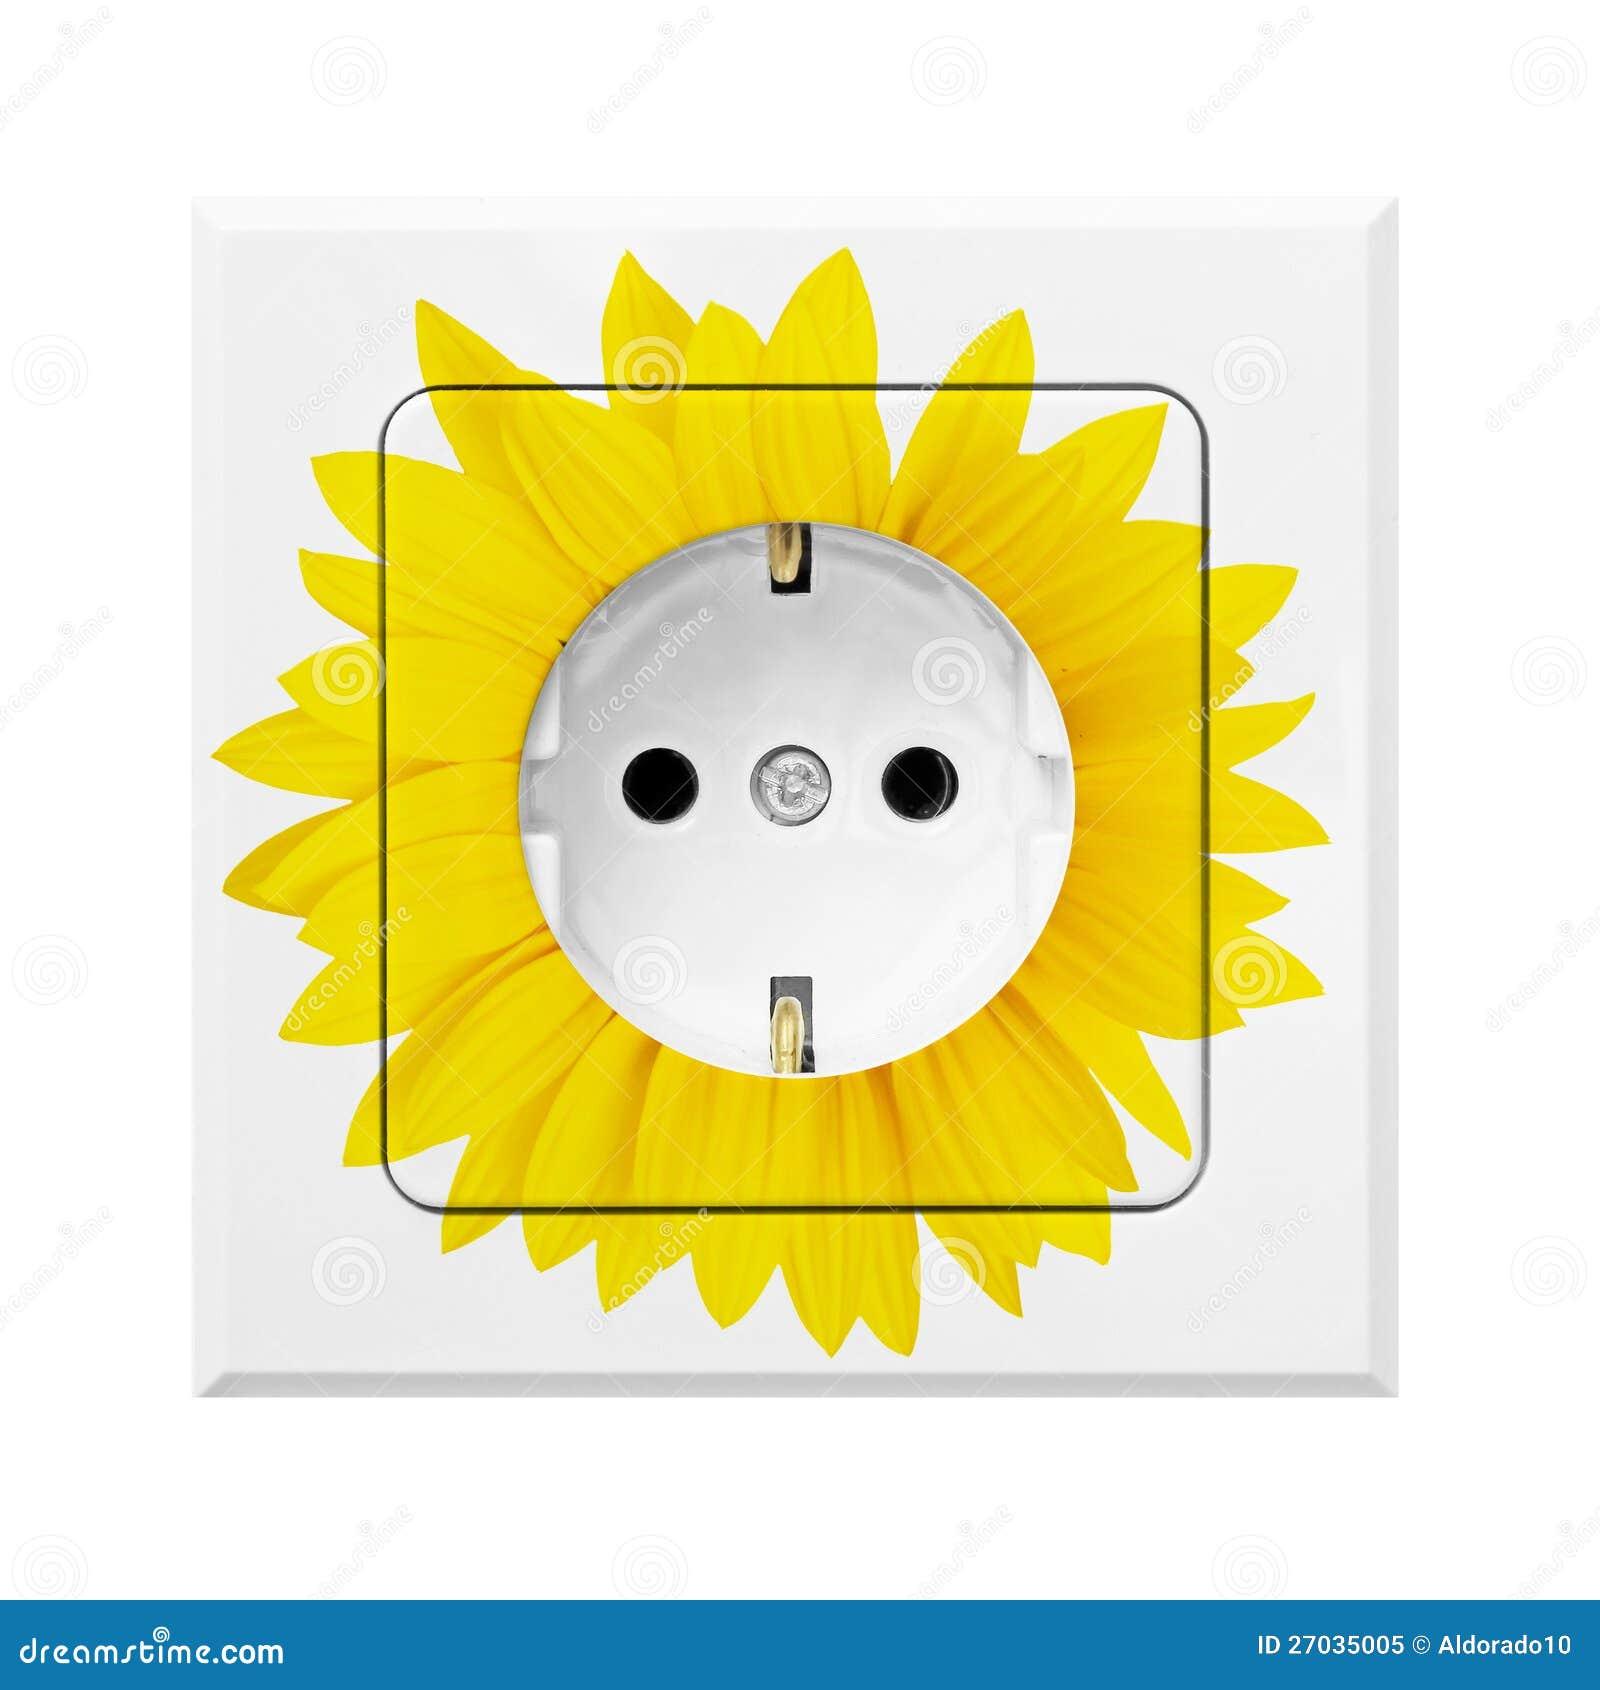 Sun Energy Royalty Free Stock Photo - Image: 27035005